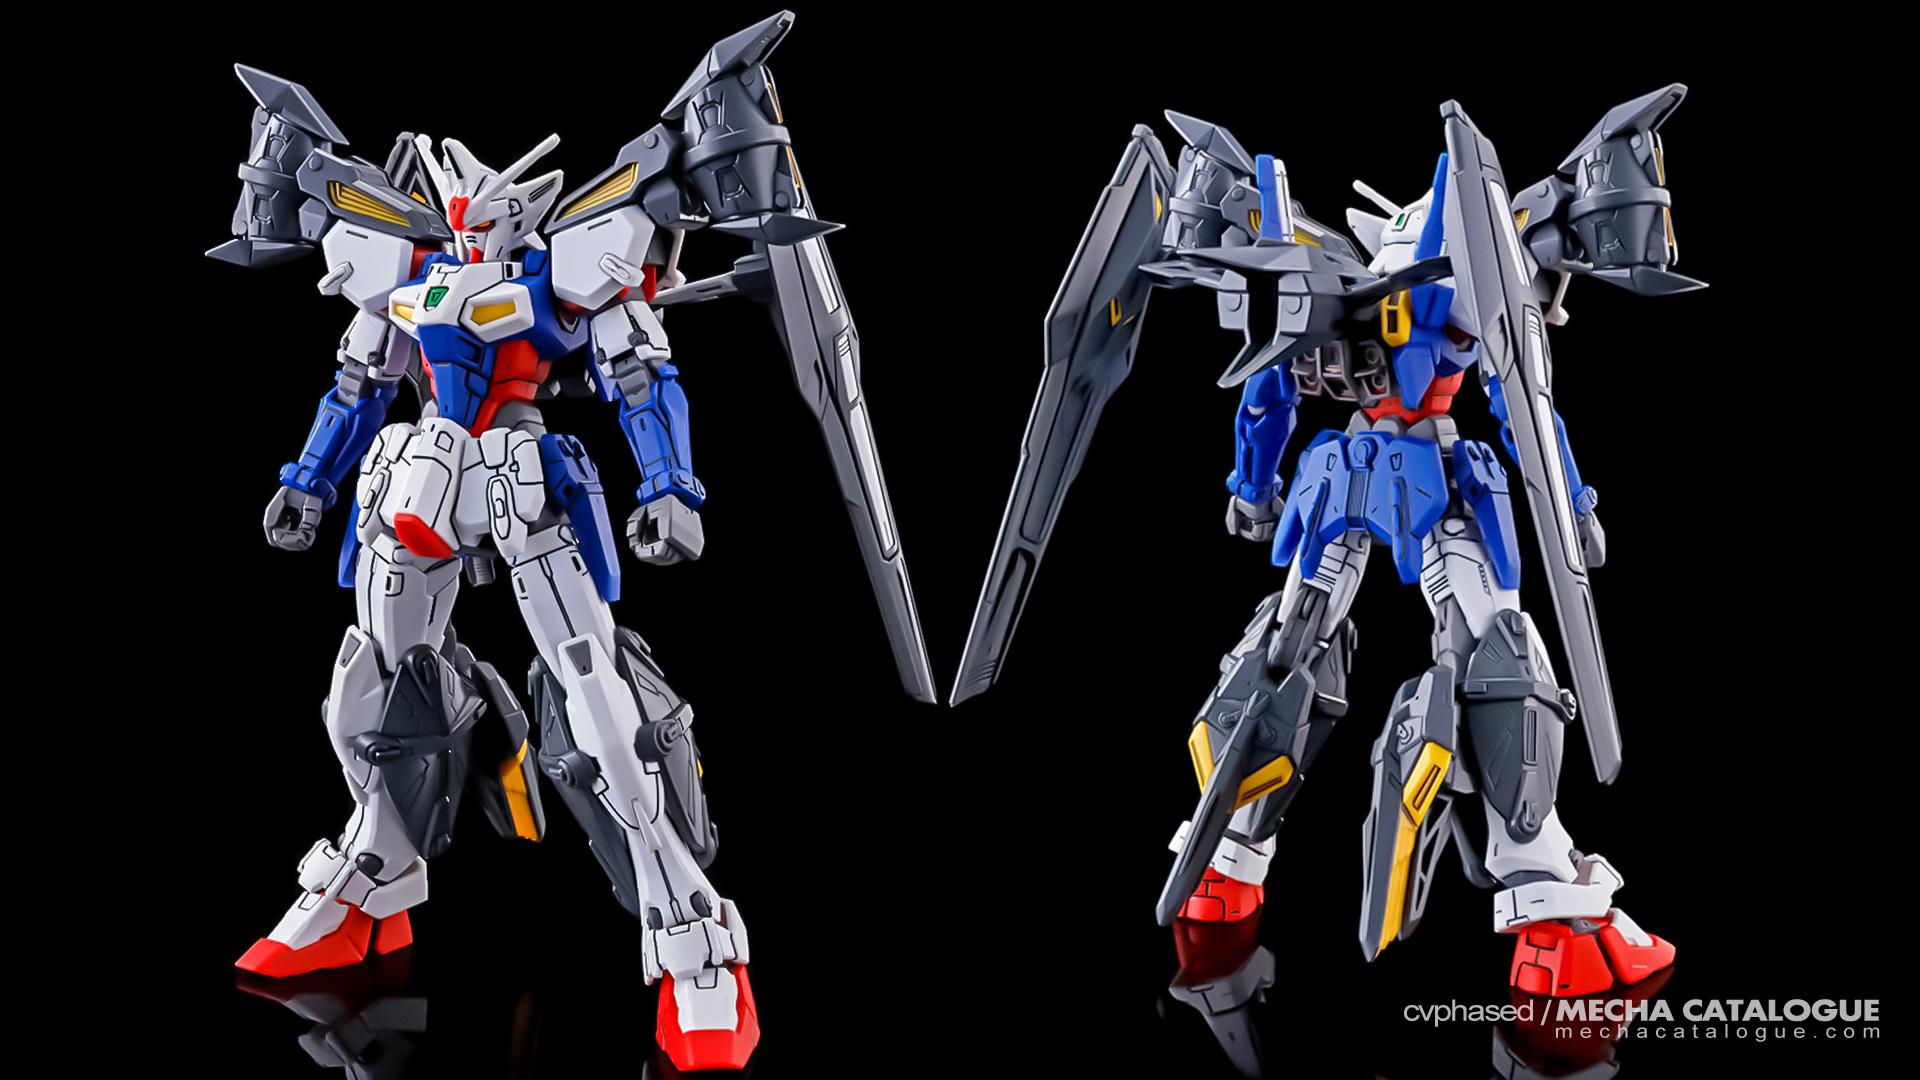 G-UNIT Re:OPERATION! HGAC Gundam Geminass 01 Assault Booster & High Mobility Unit Expansion Set